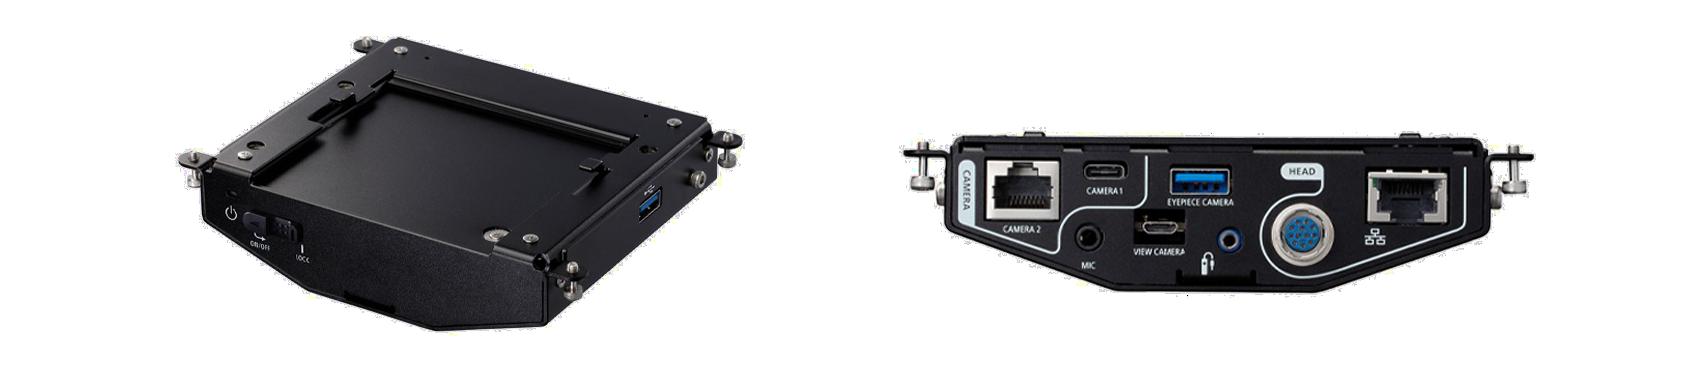 Canon CR-S700R announced